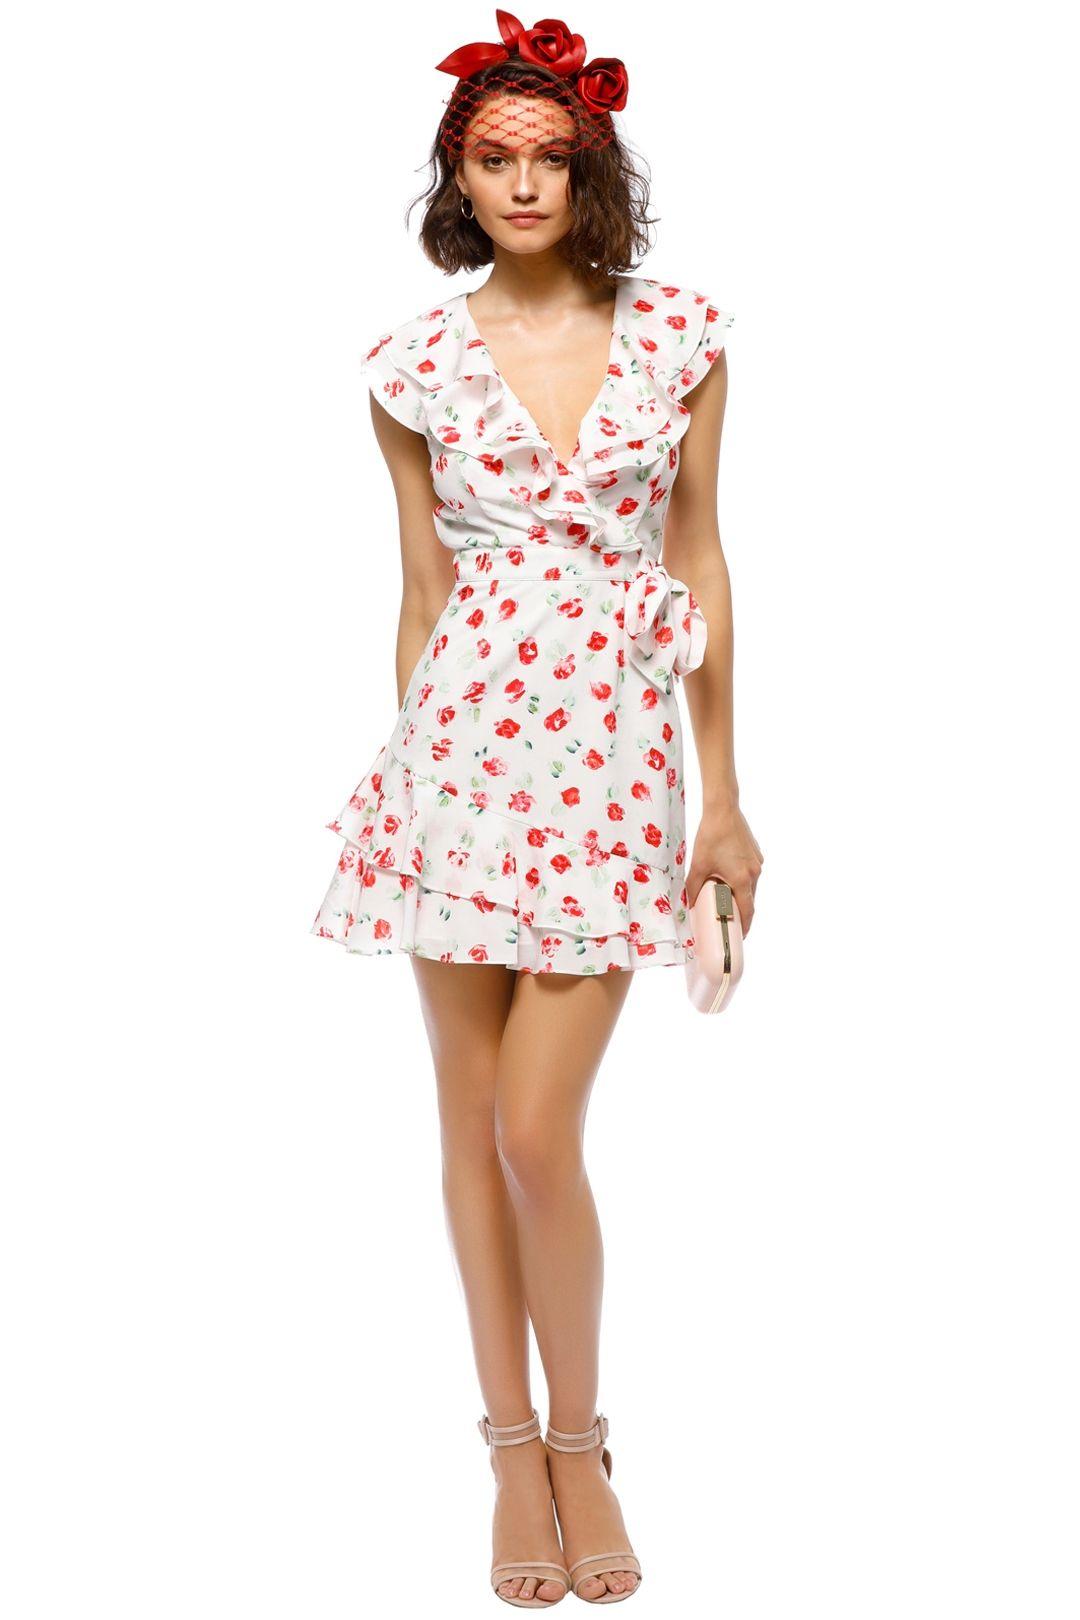 Saylor - Cassandra Dress - White Floral - Front